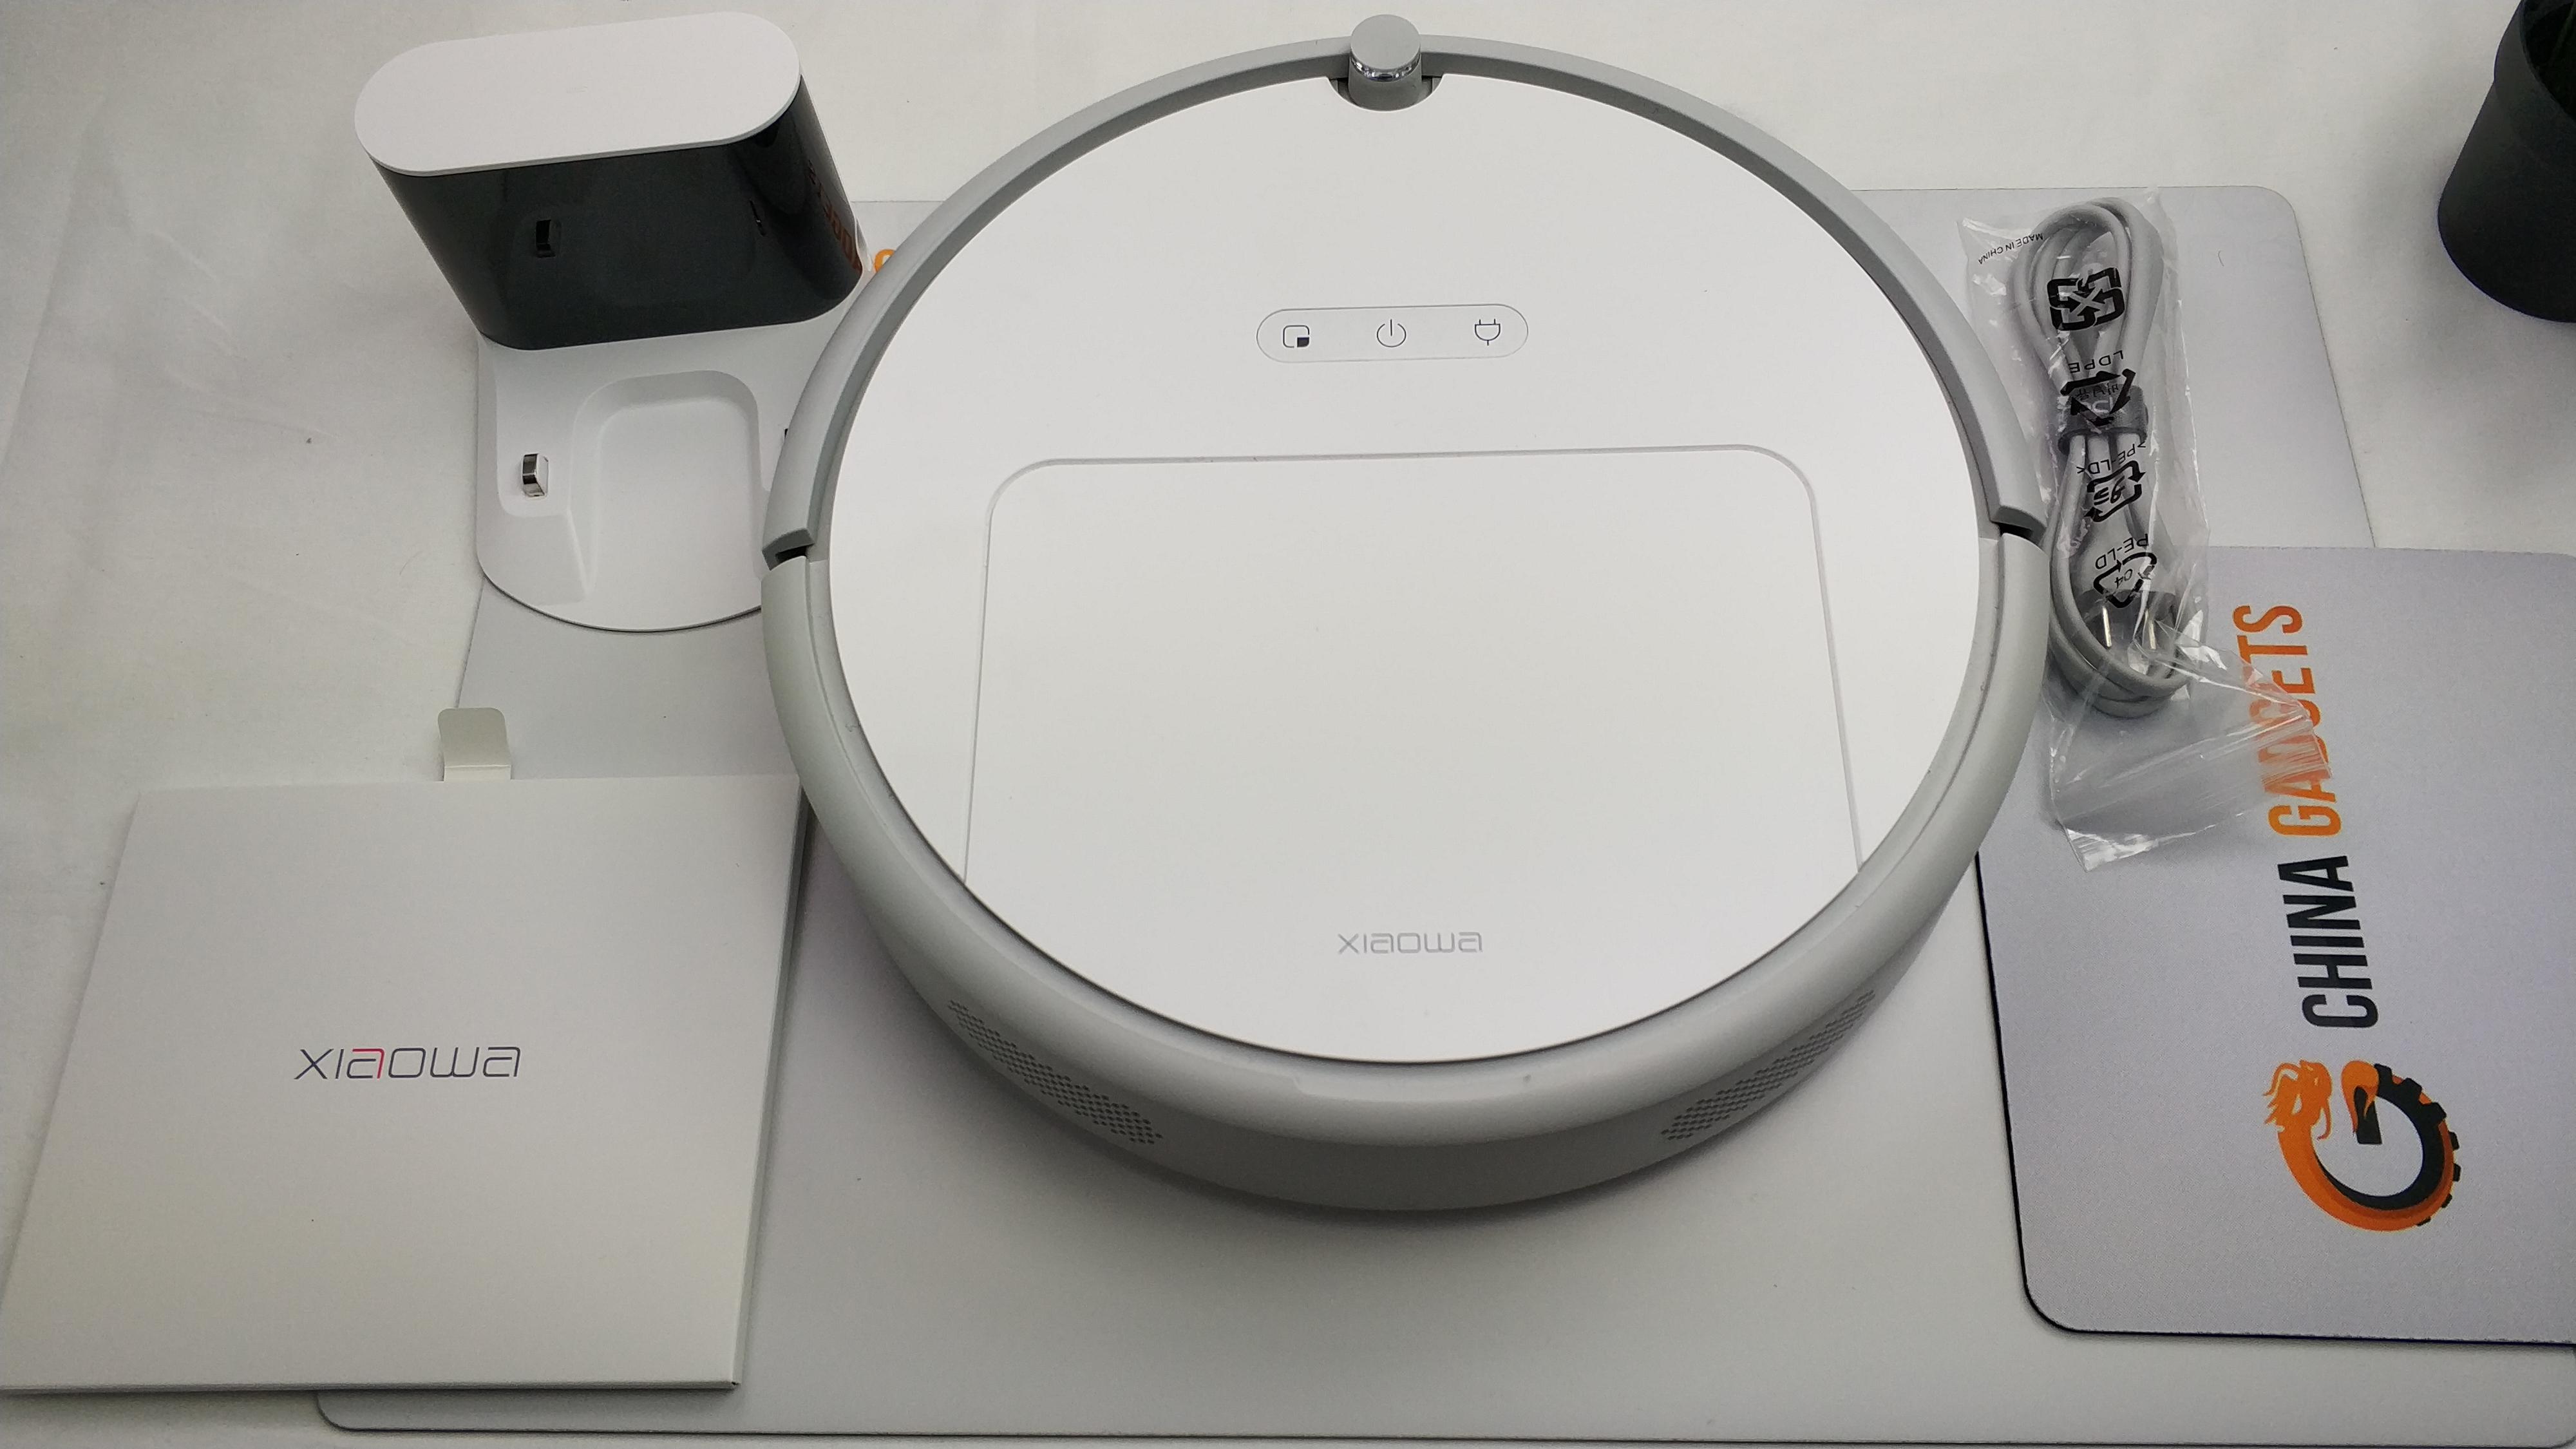 Iphone Entfernungsmesser Xiaomi : Xiaomi xiaowa saugroboter im test budget modell von